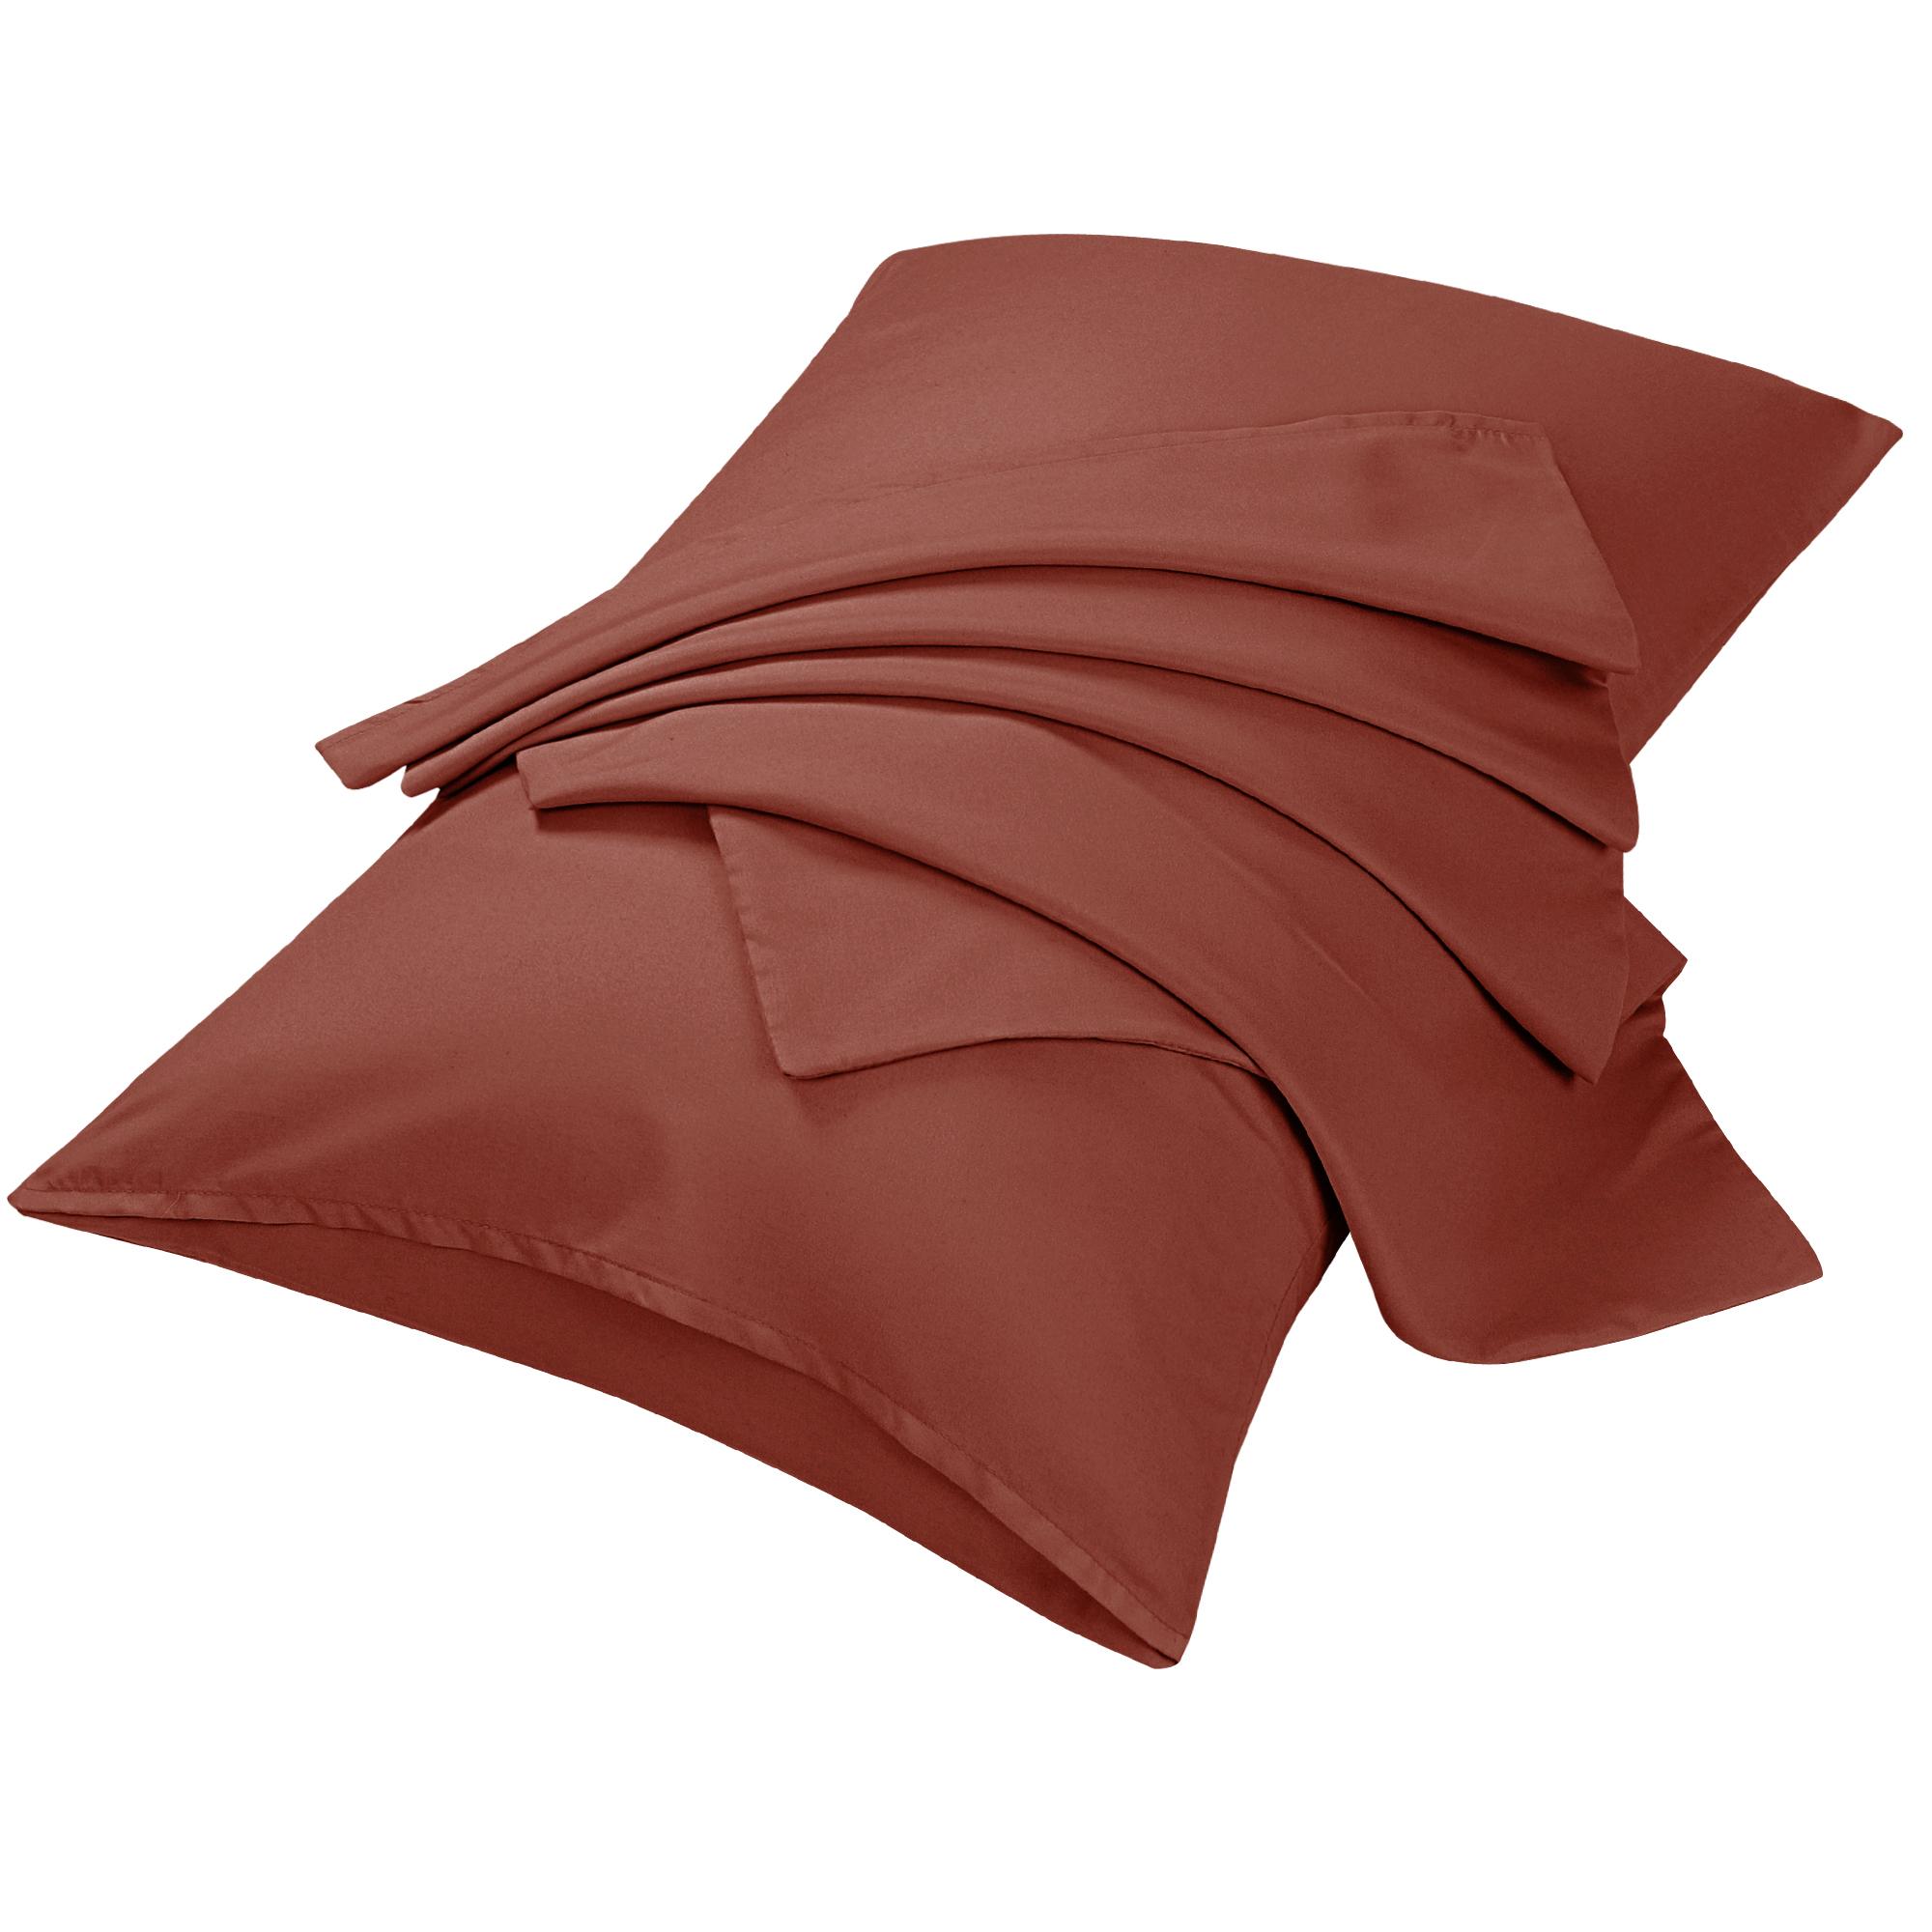 "2pcs Pillowcases Soft Microfiber, No Wrinkle, Orange King (20"" x 36"")"